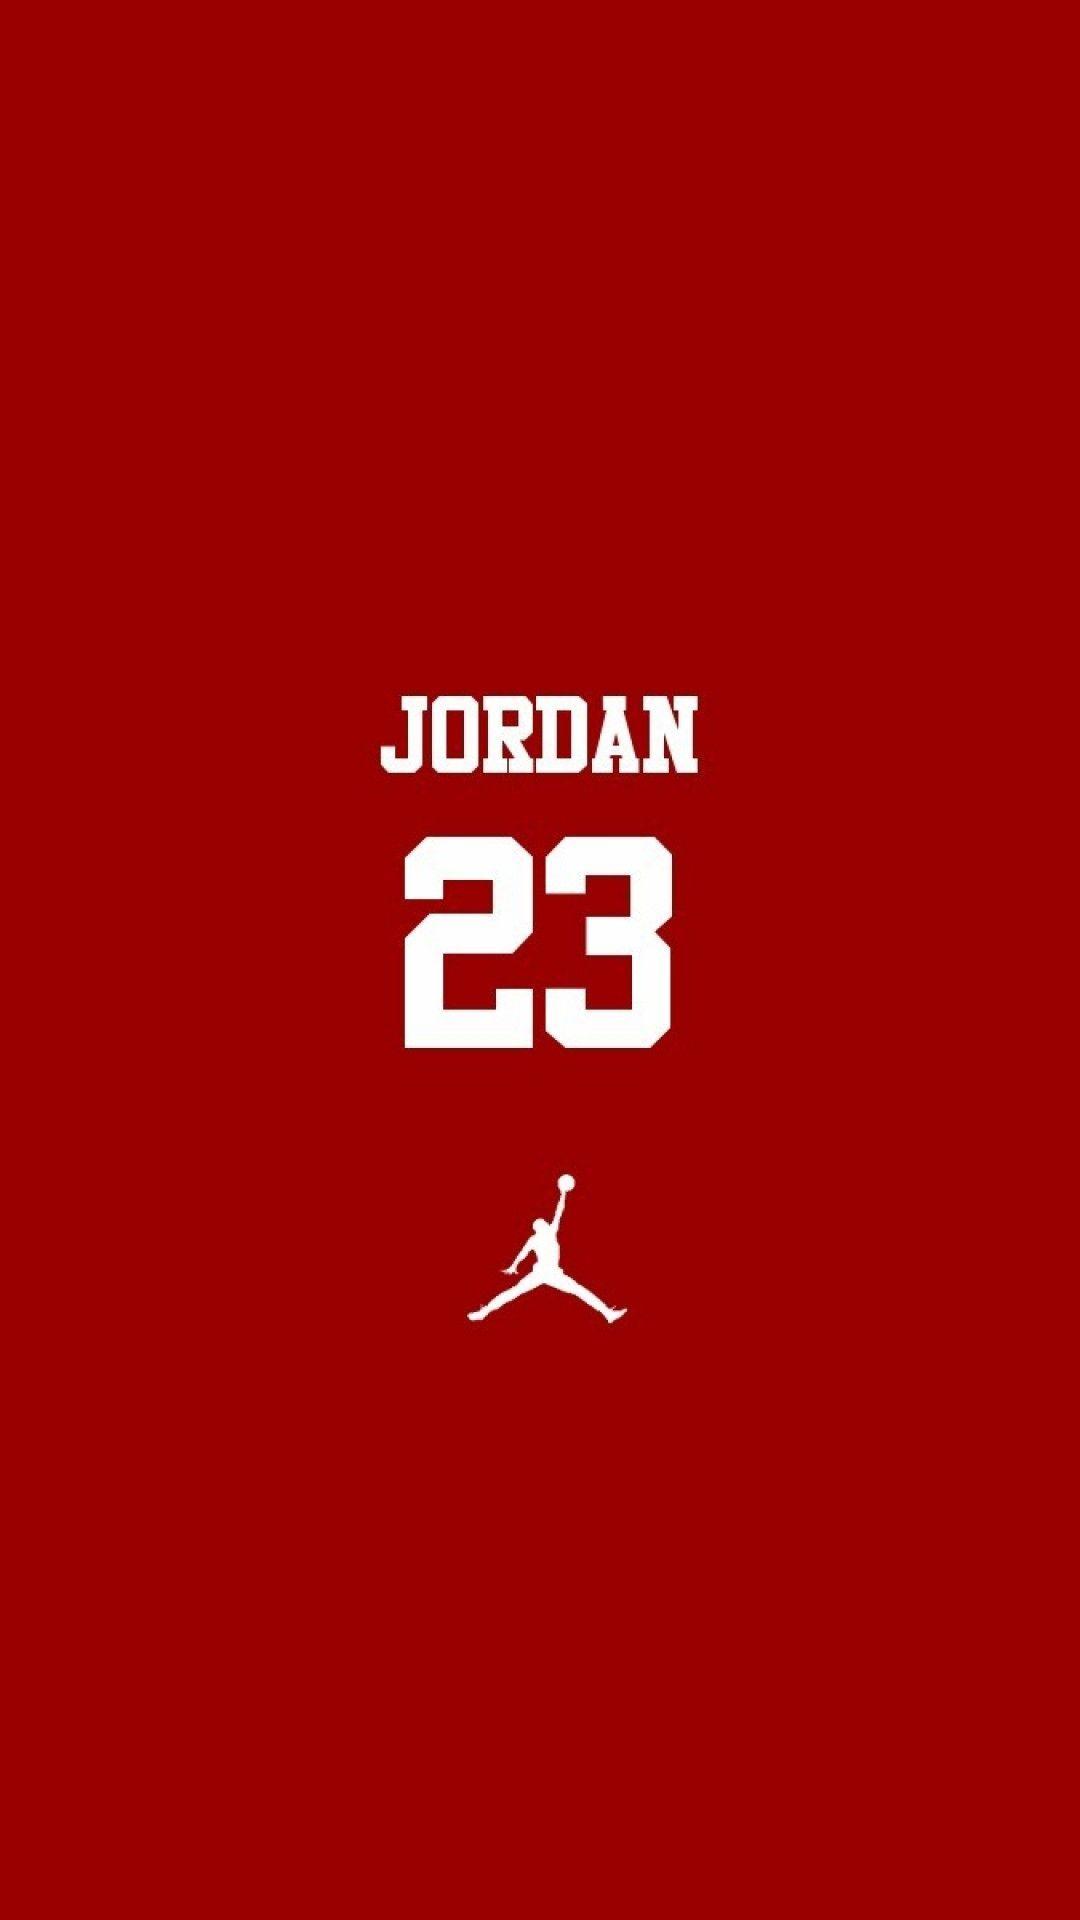 Jordan Iphone Wallpapers Top Free Jordan Iphone Backgrounds Wallpaperaccess Jordan Logo Wallpaper Michael Jordan Art Iphone Wallpaper Jordan